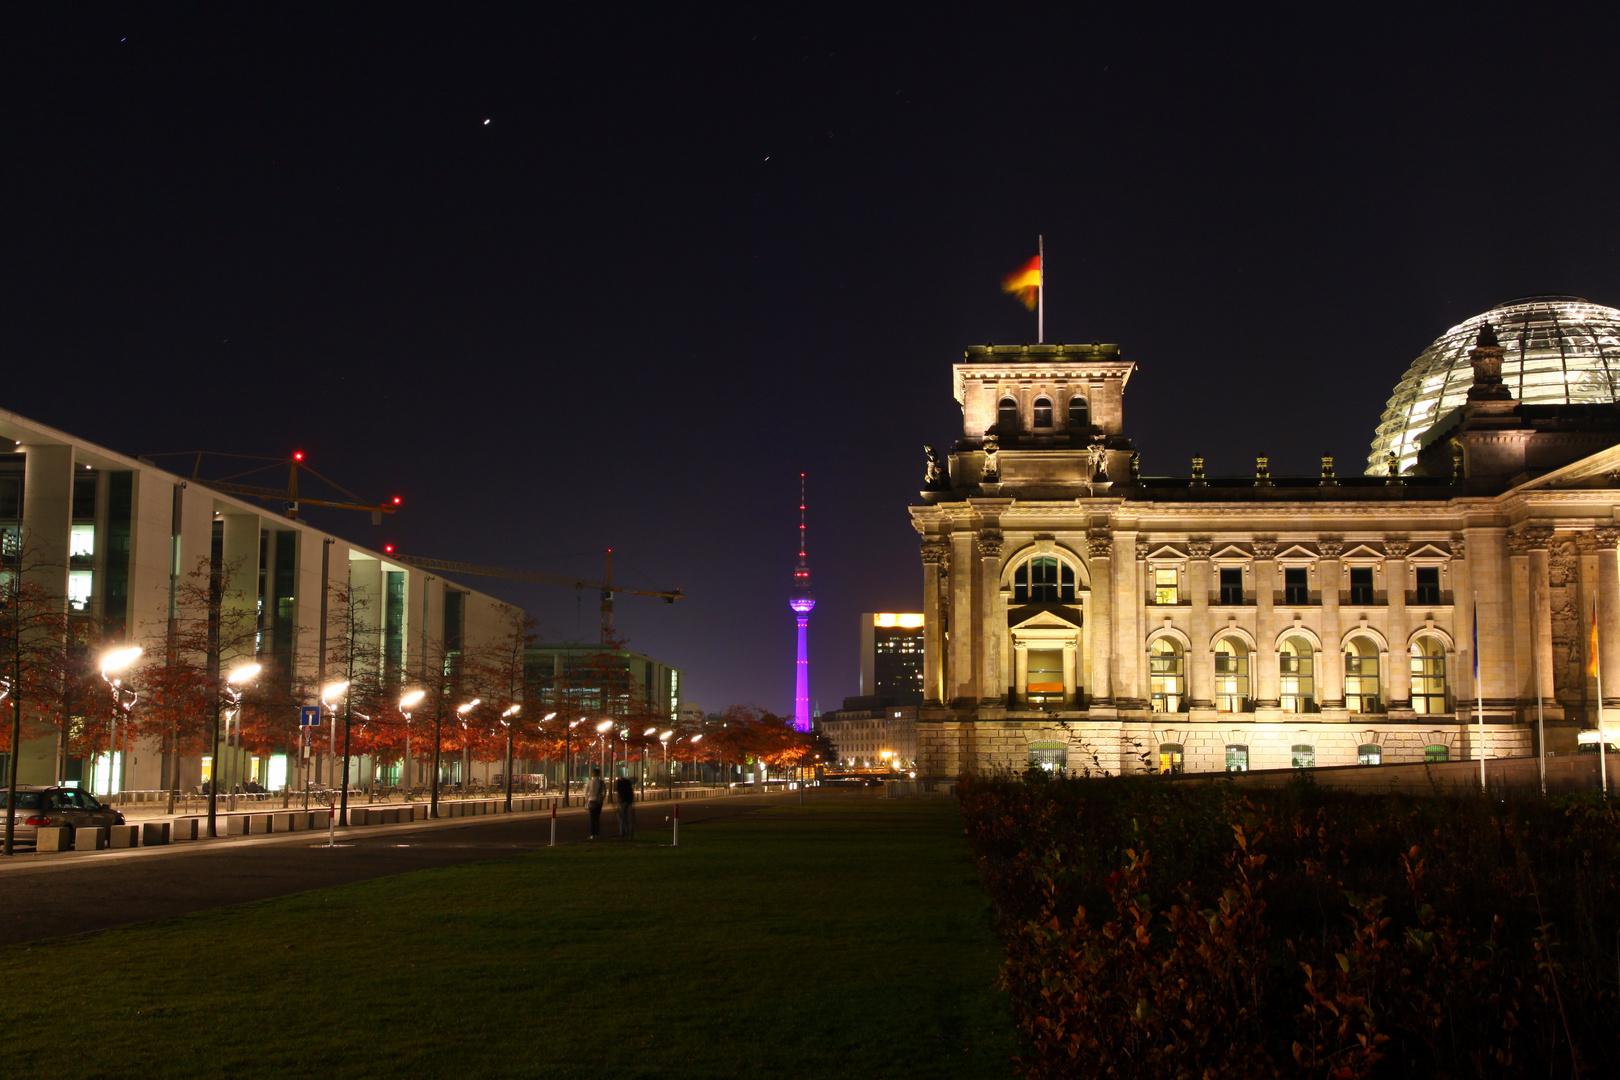 Berlin - Festival of Lights 2012 - Reichstag